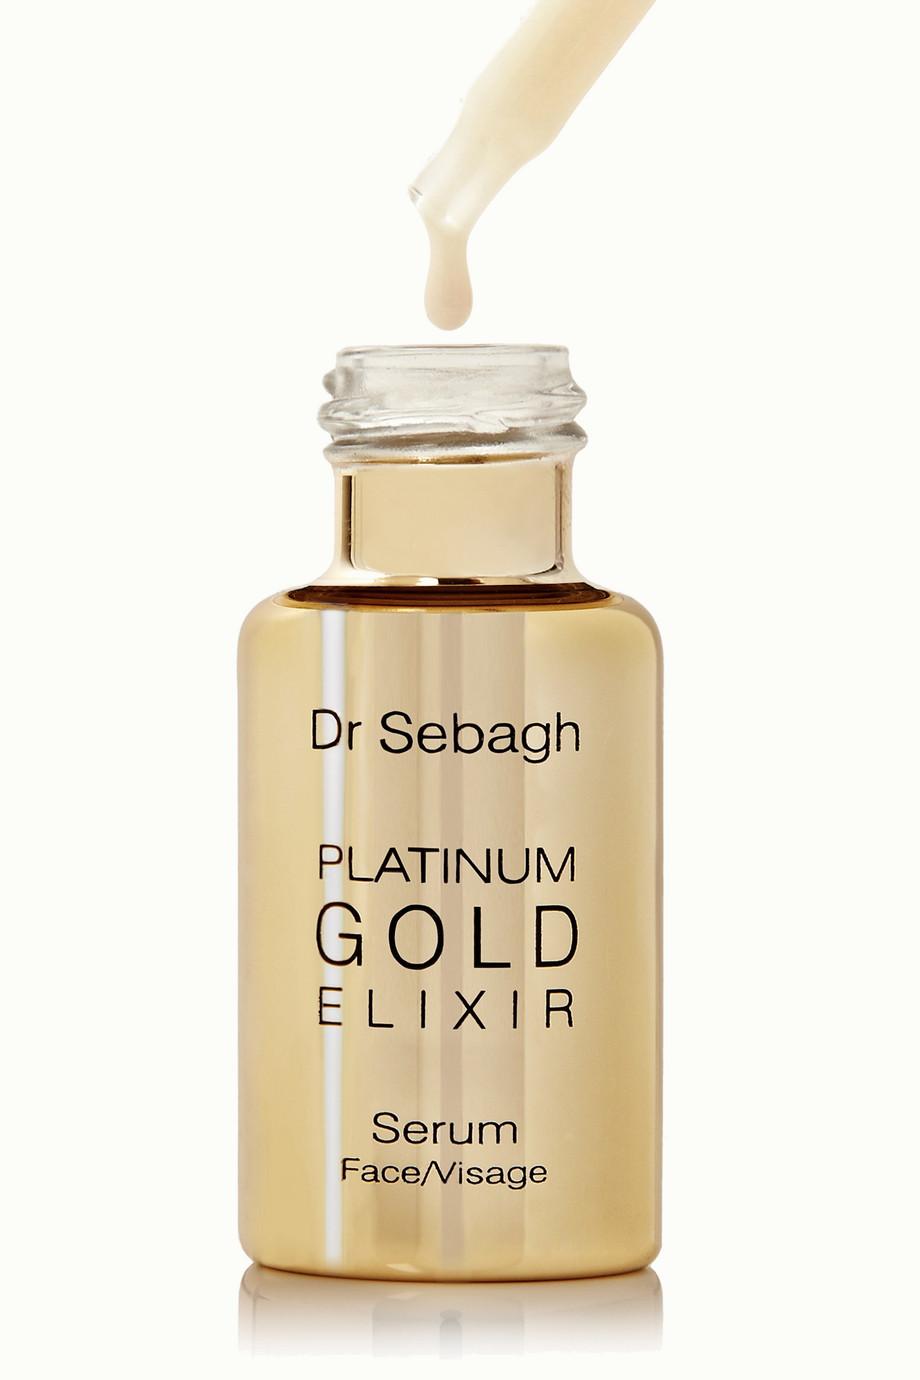 Dr Sebagh Platinum Gold Elixir, 4 x 10ml